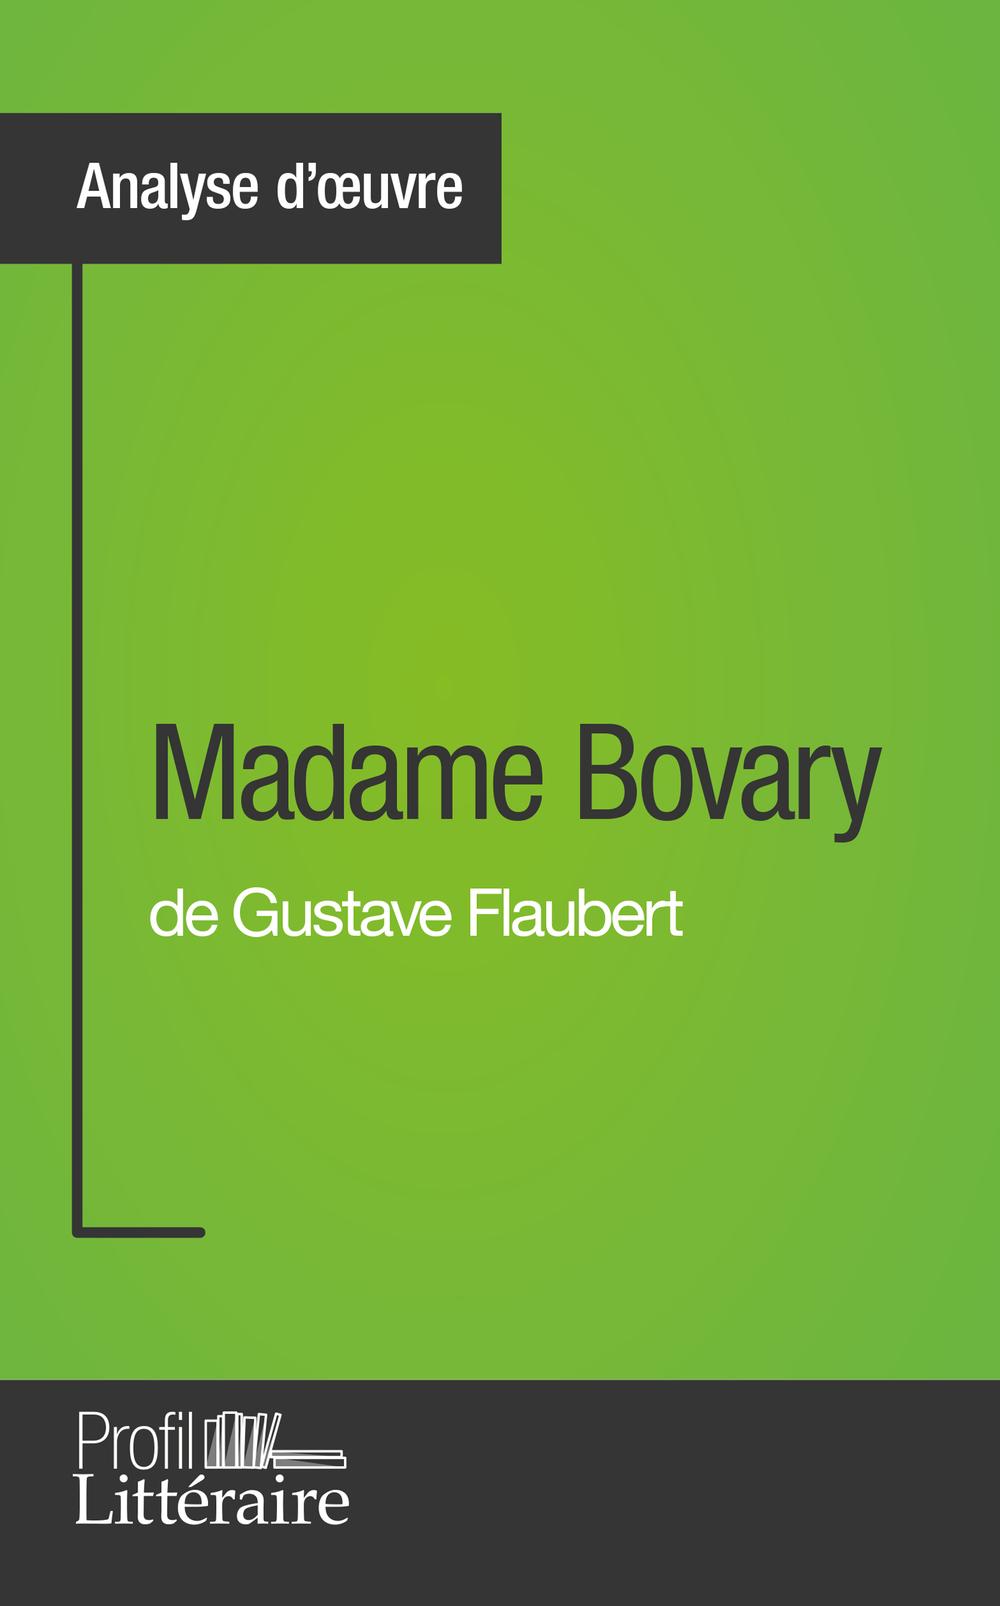 Madame Bovary de Gustave Flaubert (Analyse approfondie)